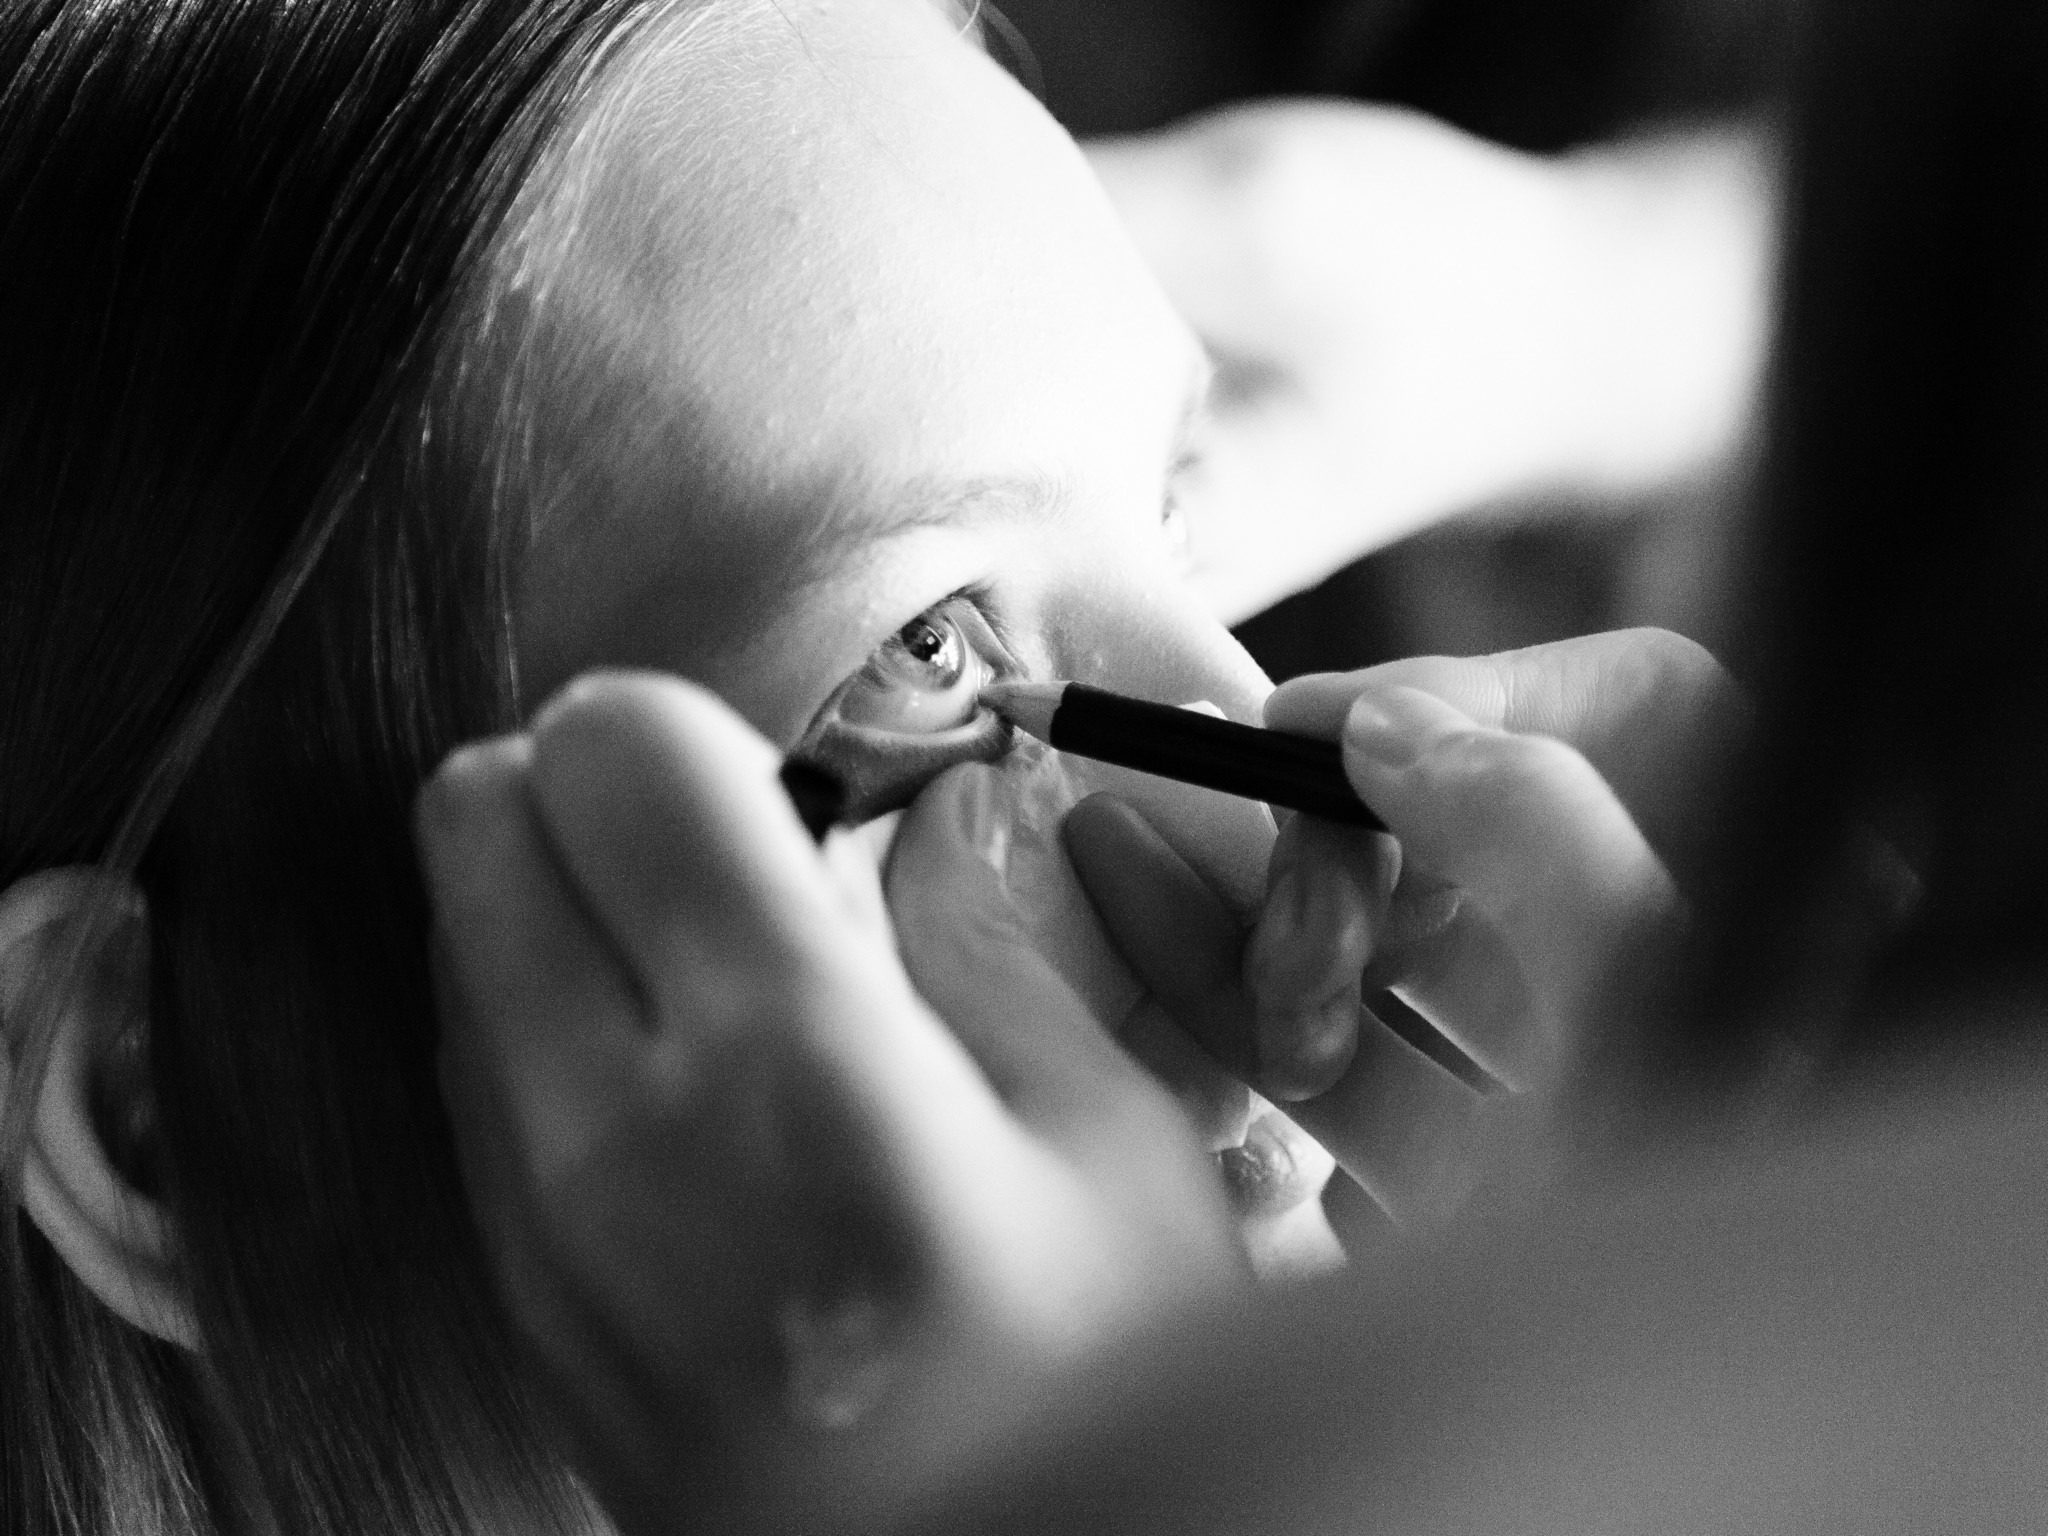 London Fashion Week LFW Runway Show Photography Photograph How to Model Walking Catwalk Youtube Video Guide Tutorial Backstage Eye Makeup Make Up